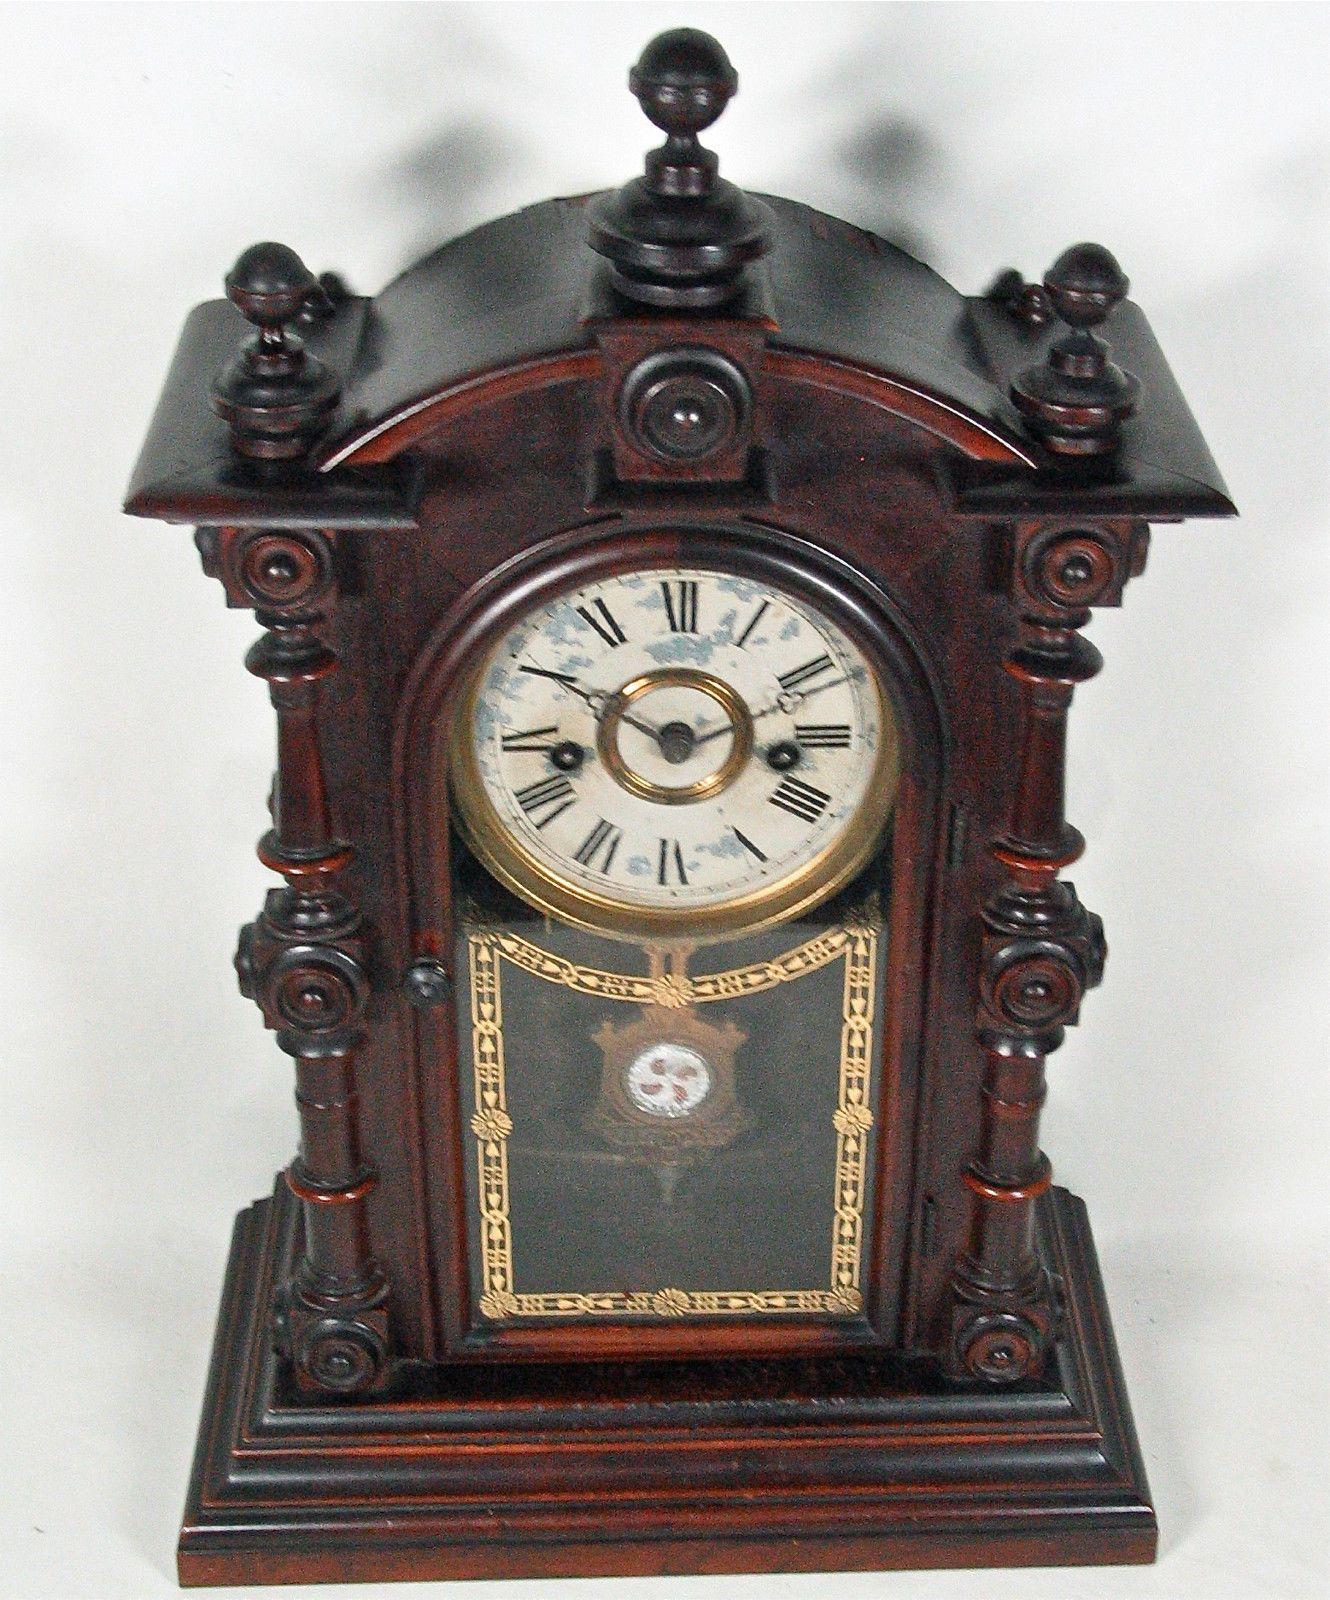 Antique clocks ansonia clock ansonia clock co exact model rare antique welch spring patti v p 8 day rosewood mantel clock original only amipublicfo Images